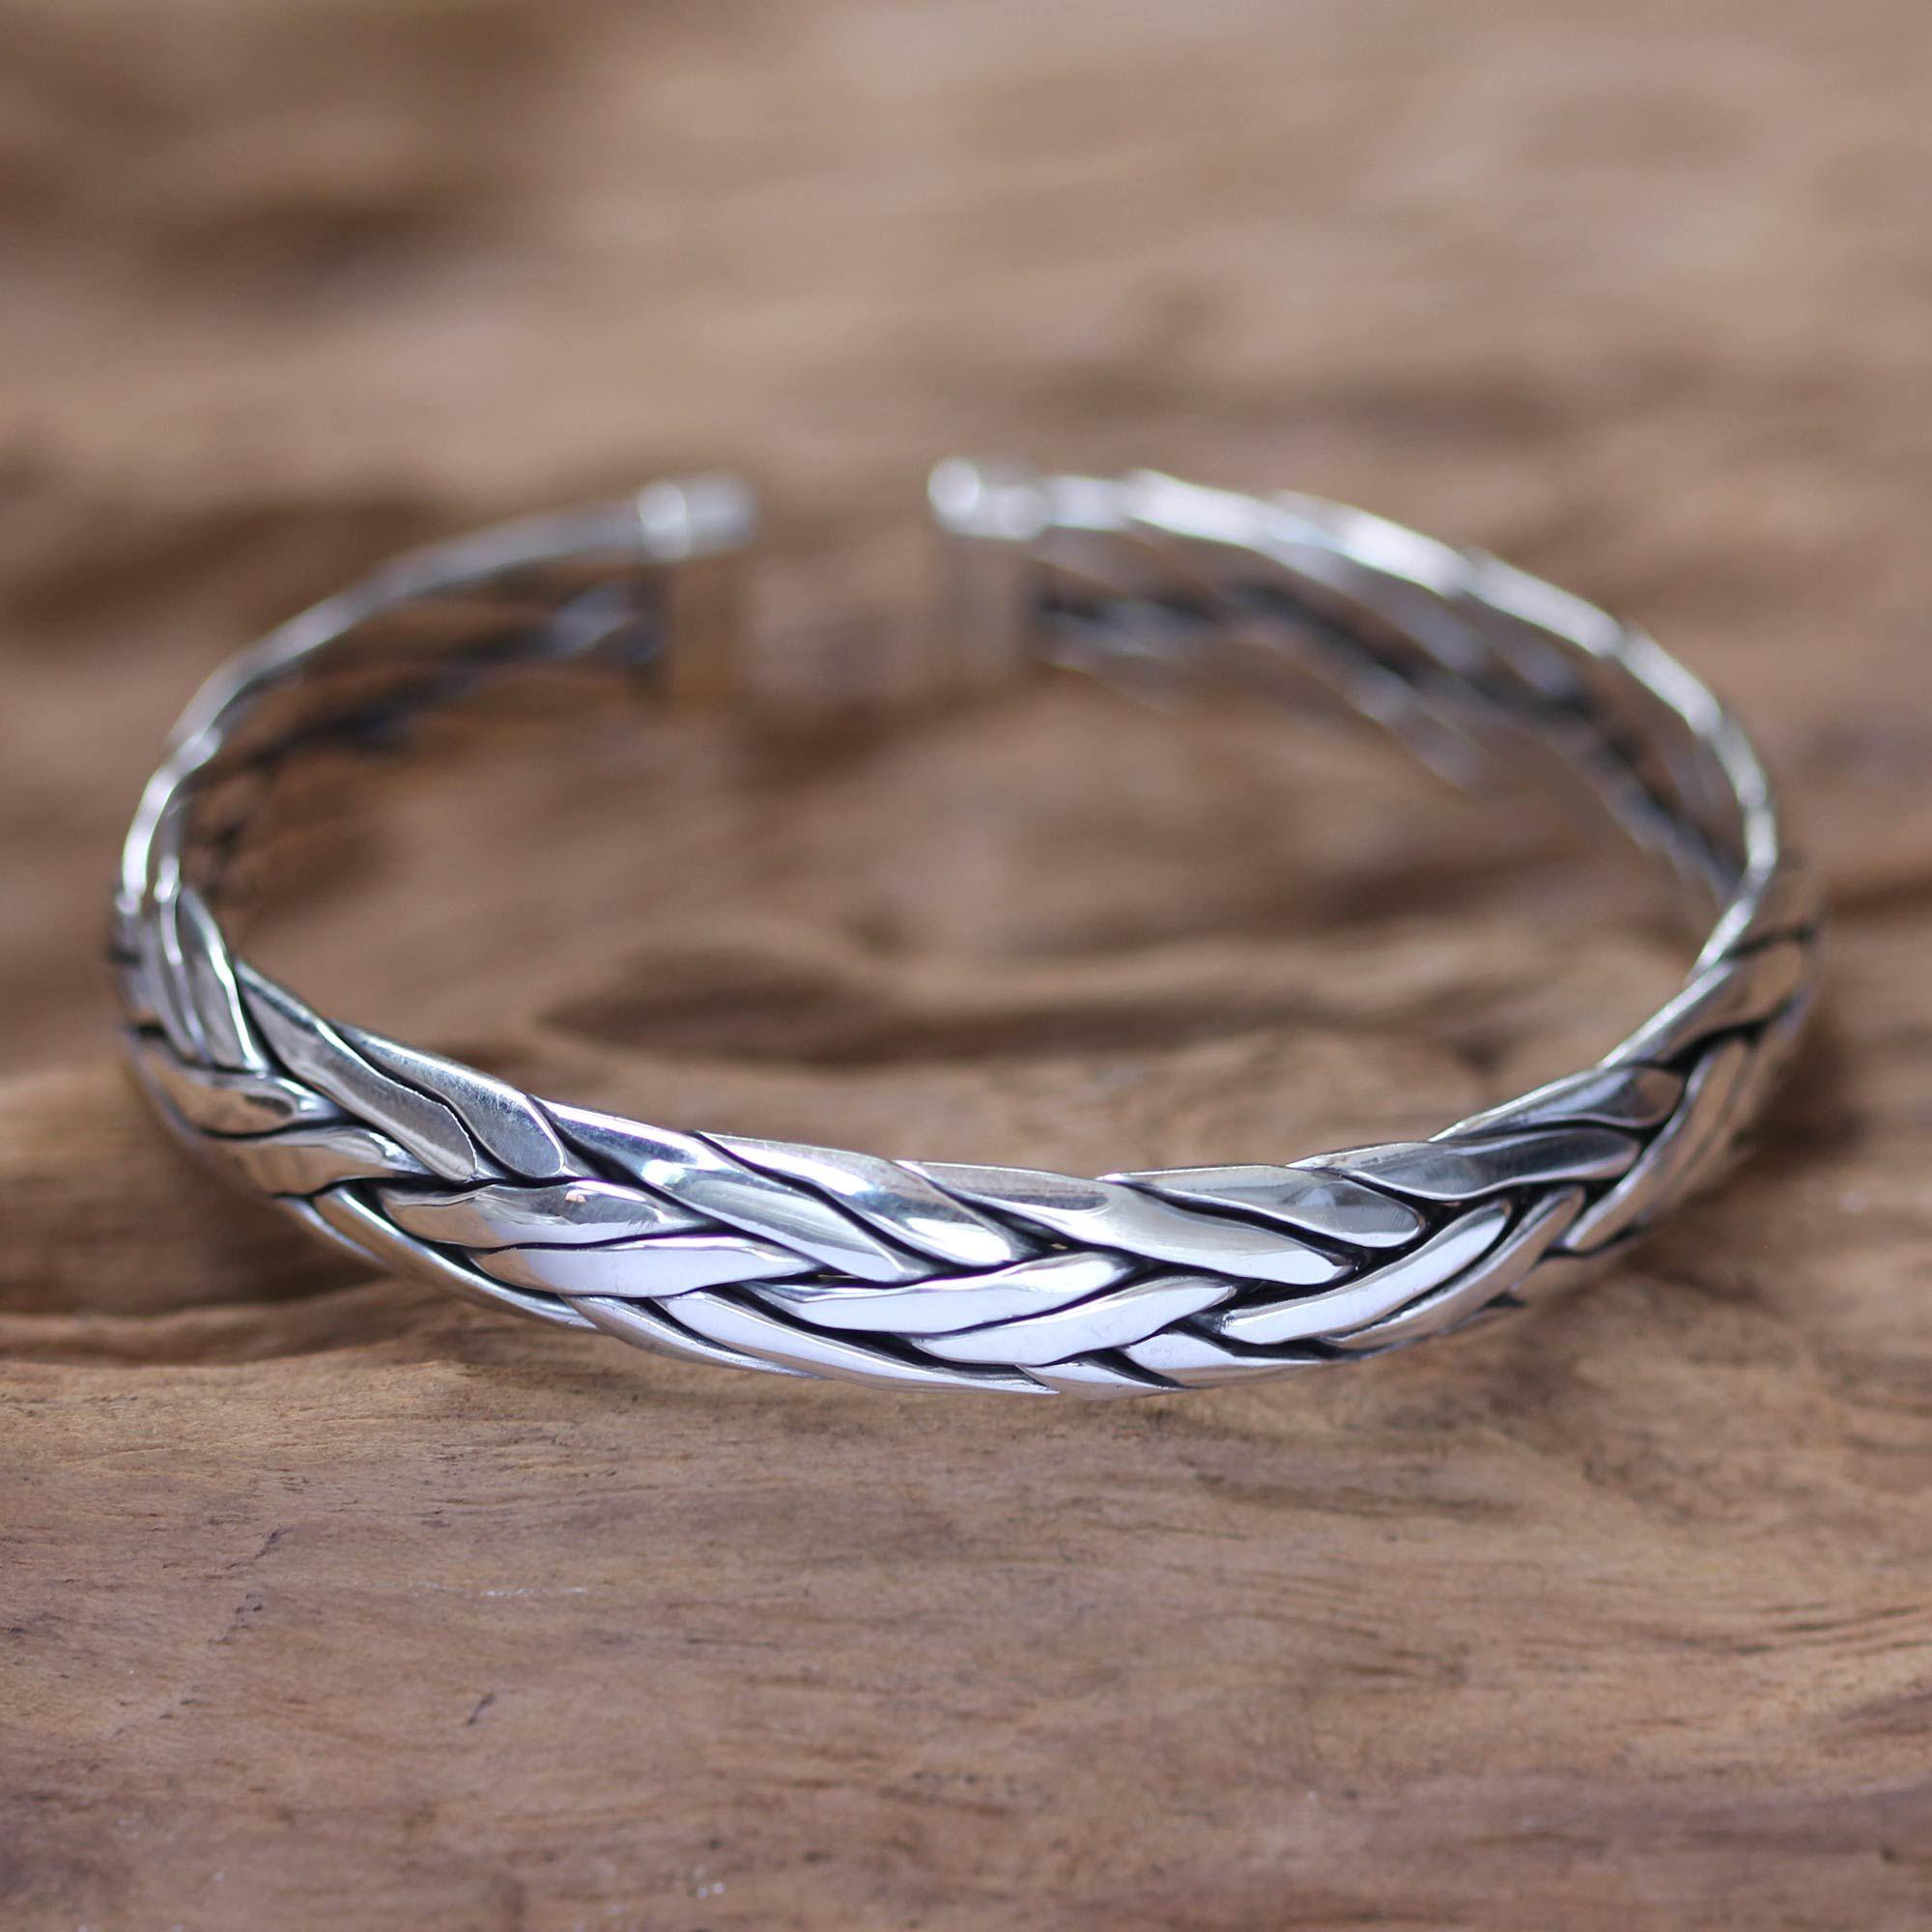 mens silver bracelets indian - Google Search | jewelery ...